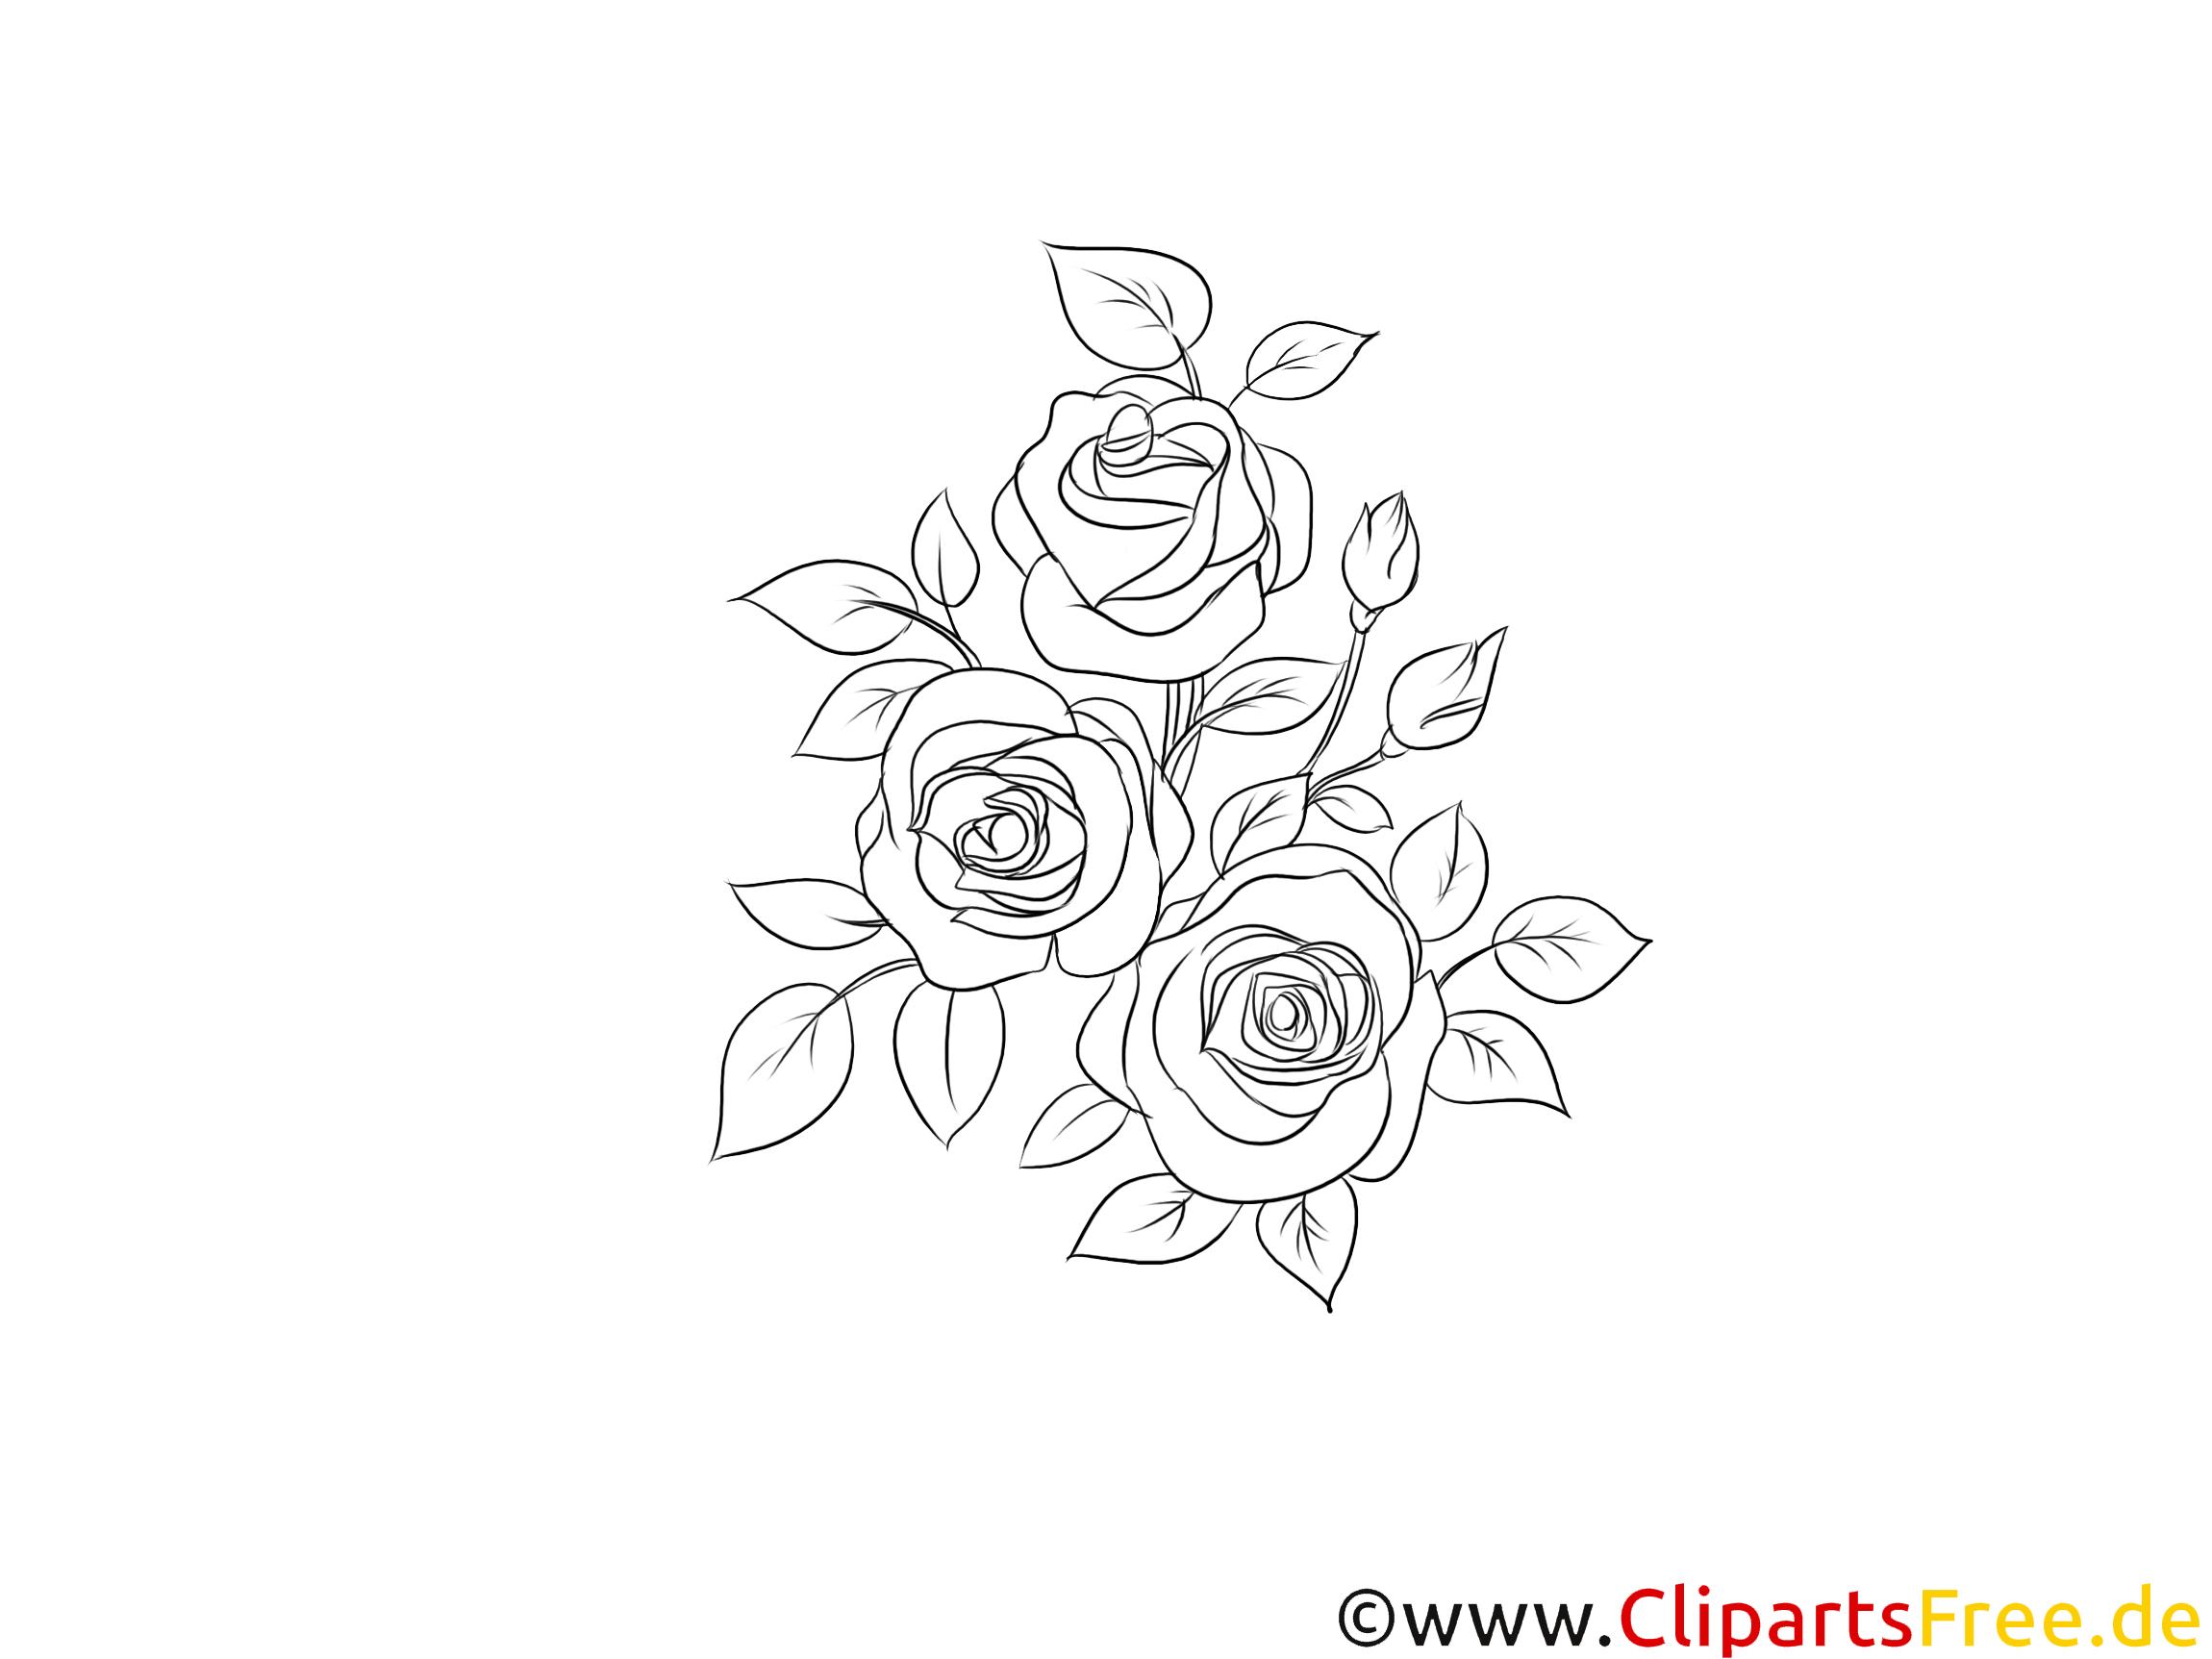 Rosen zum Ausmalen Clipart